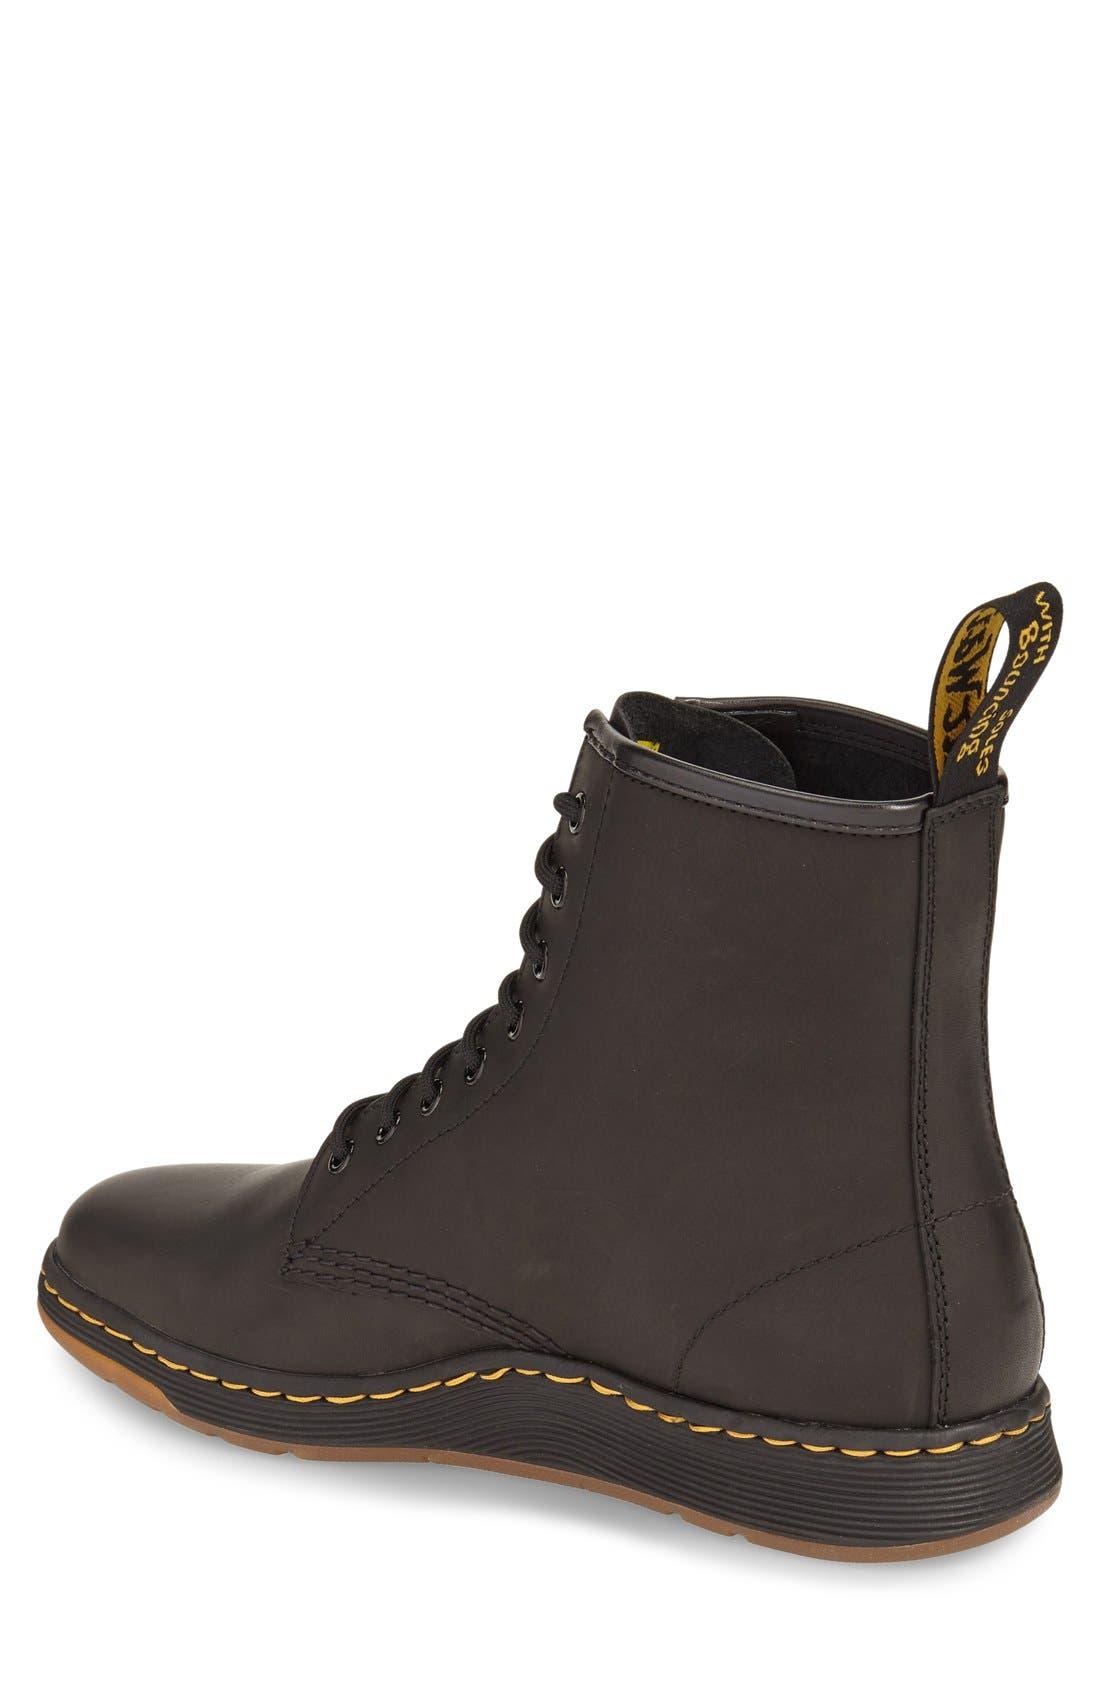 'Newton' Boot,                             Alternate thumbnail 2, color,                             Black Leather